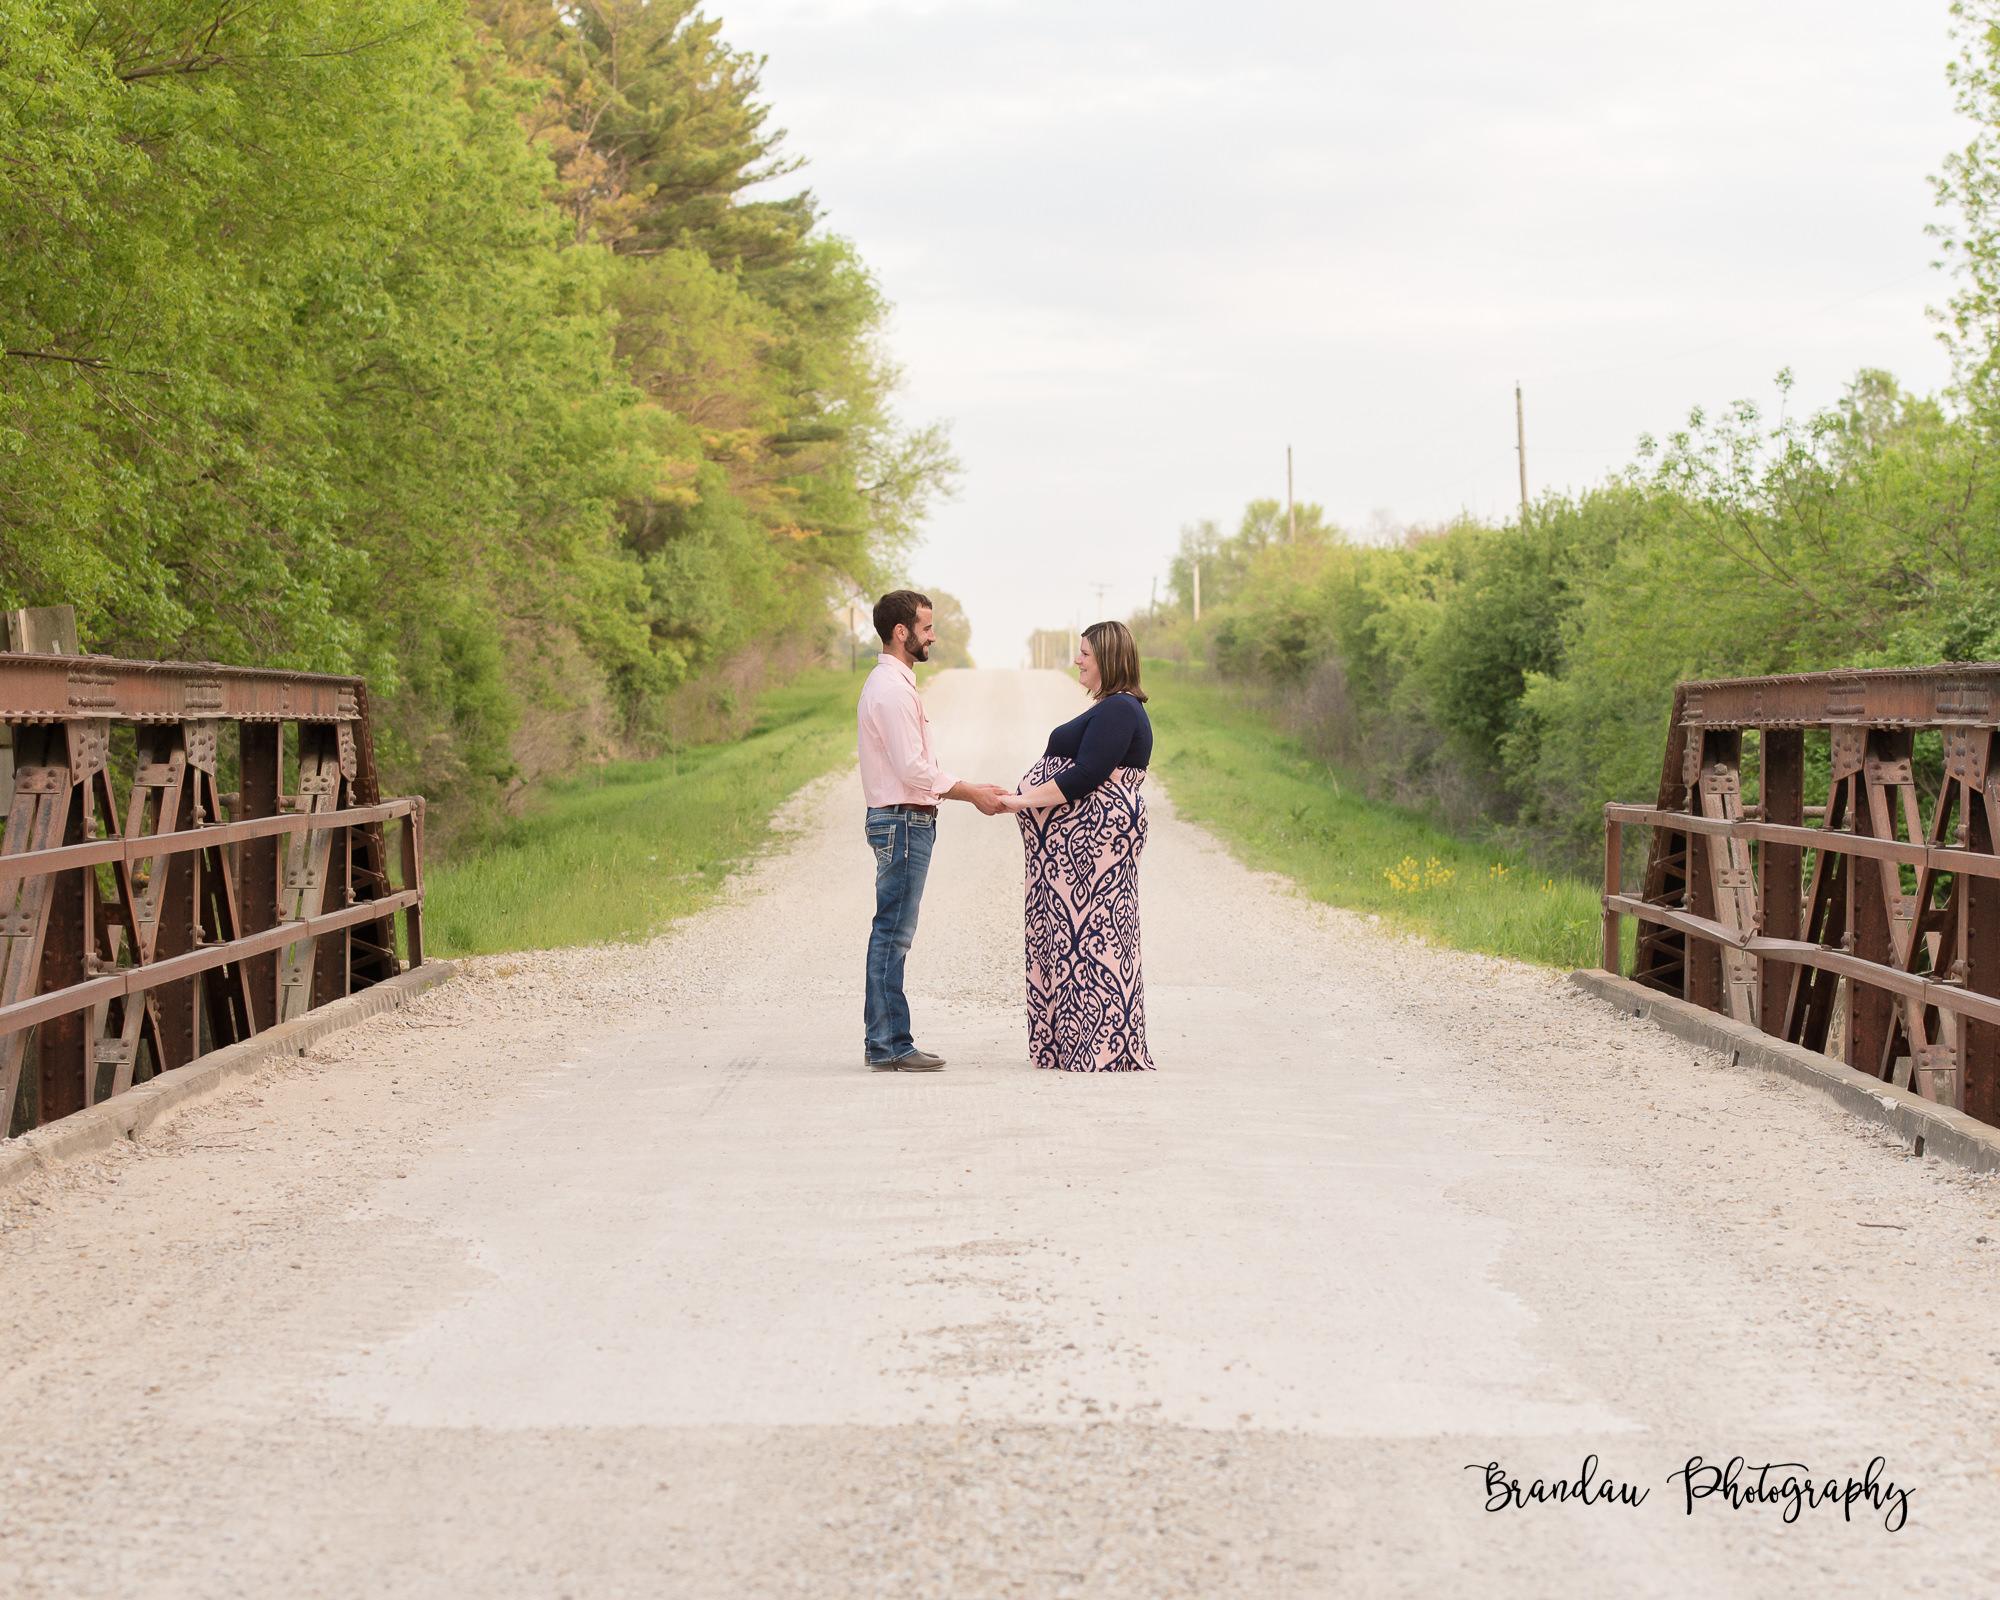 Engagement Bridge Iowa_Brandau Photography-24.jpg